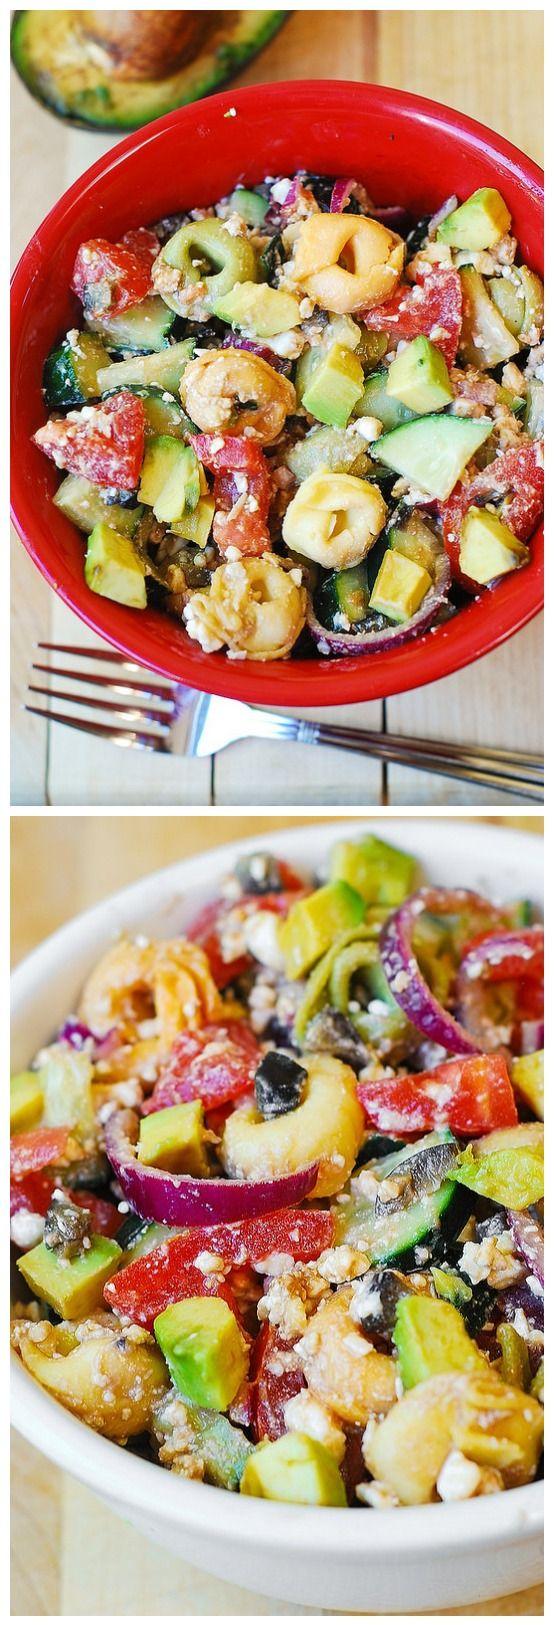 Greek Tortellini Salad Tomatoes, Avocados, Cucumbers